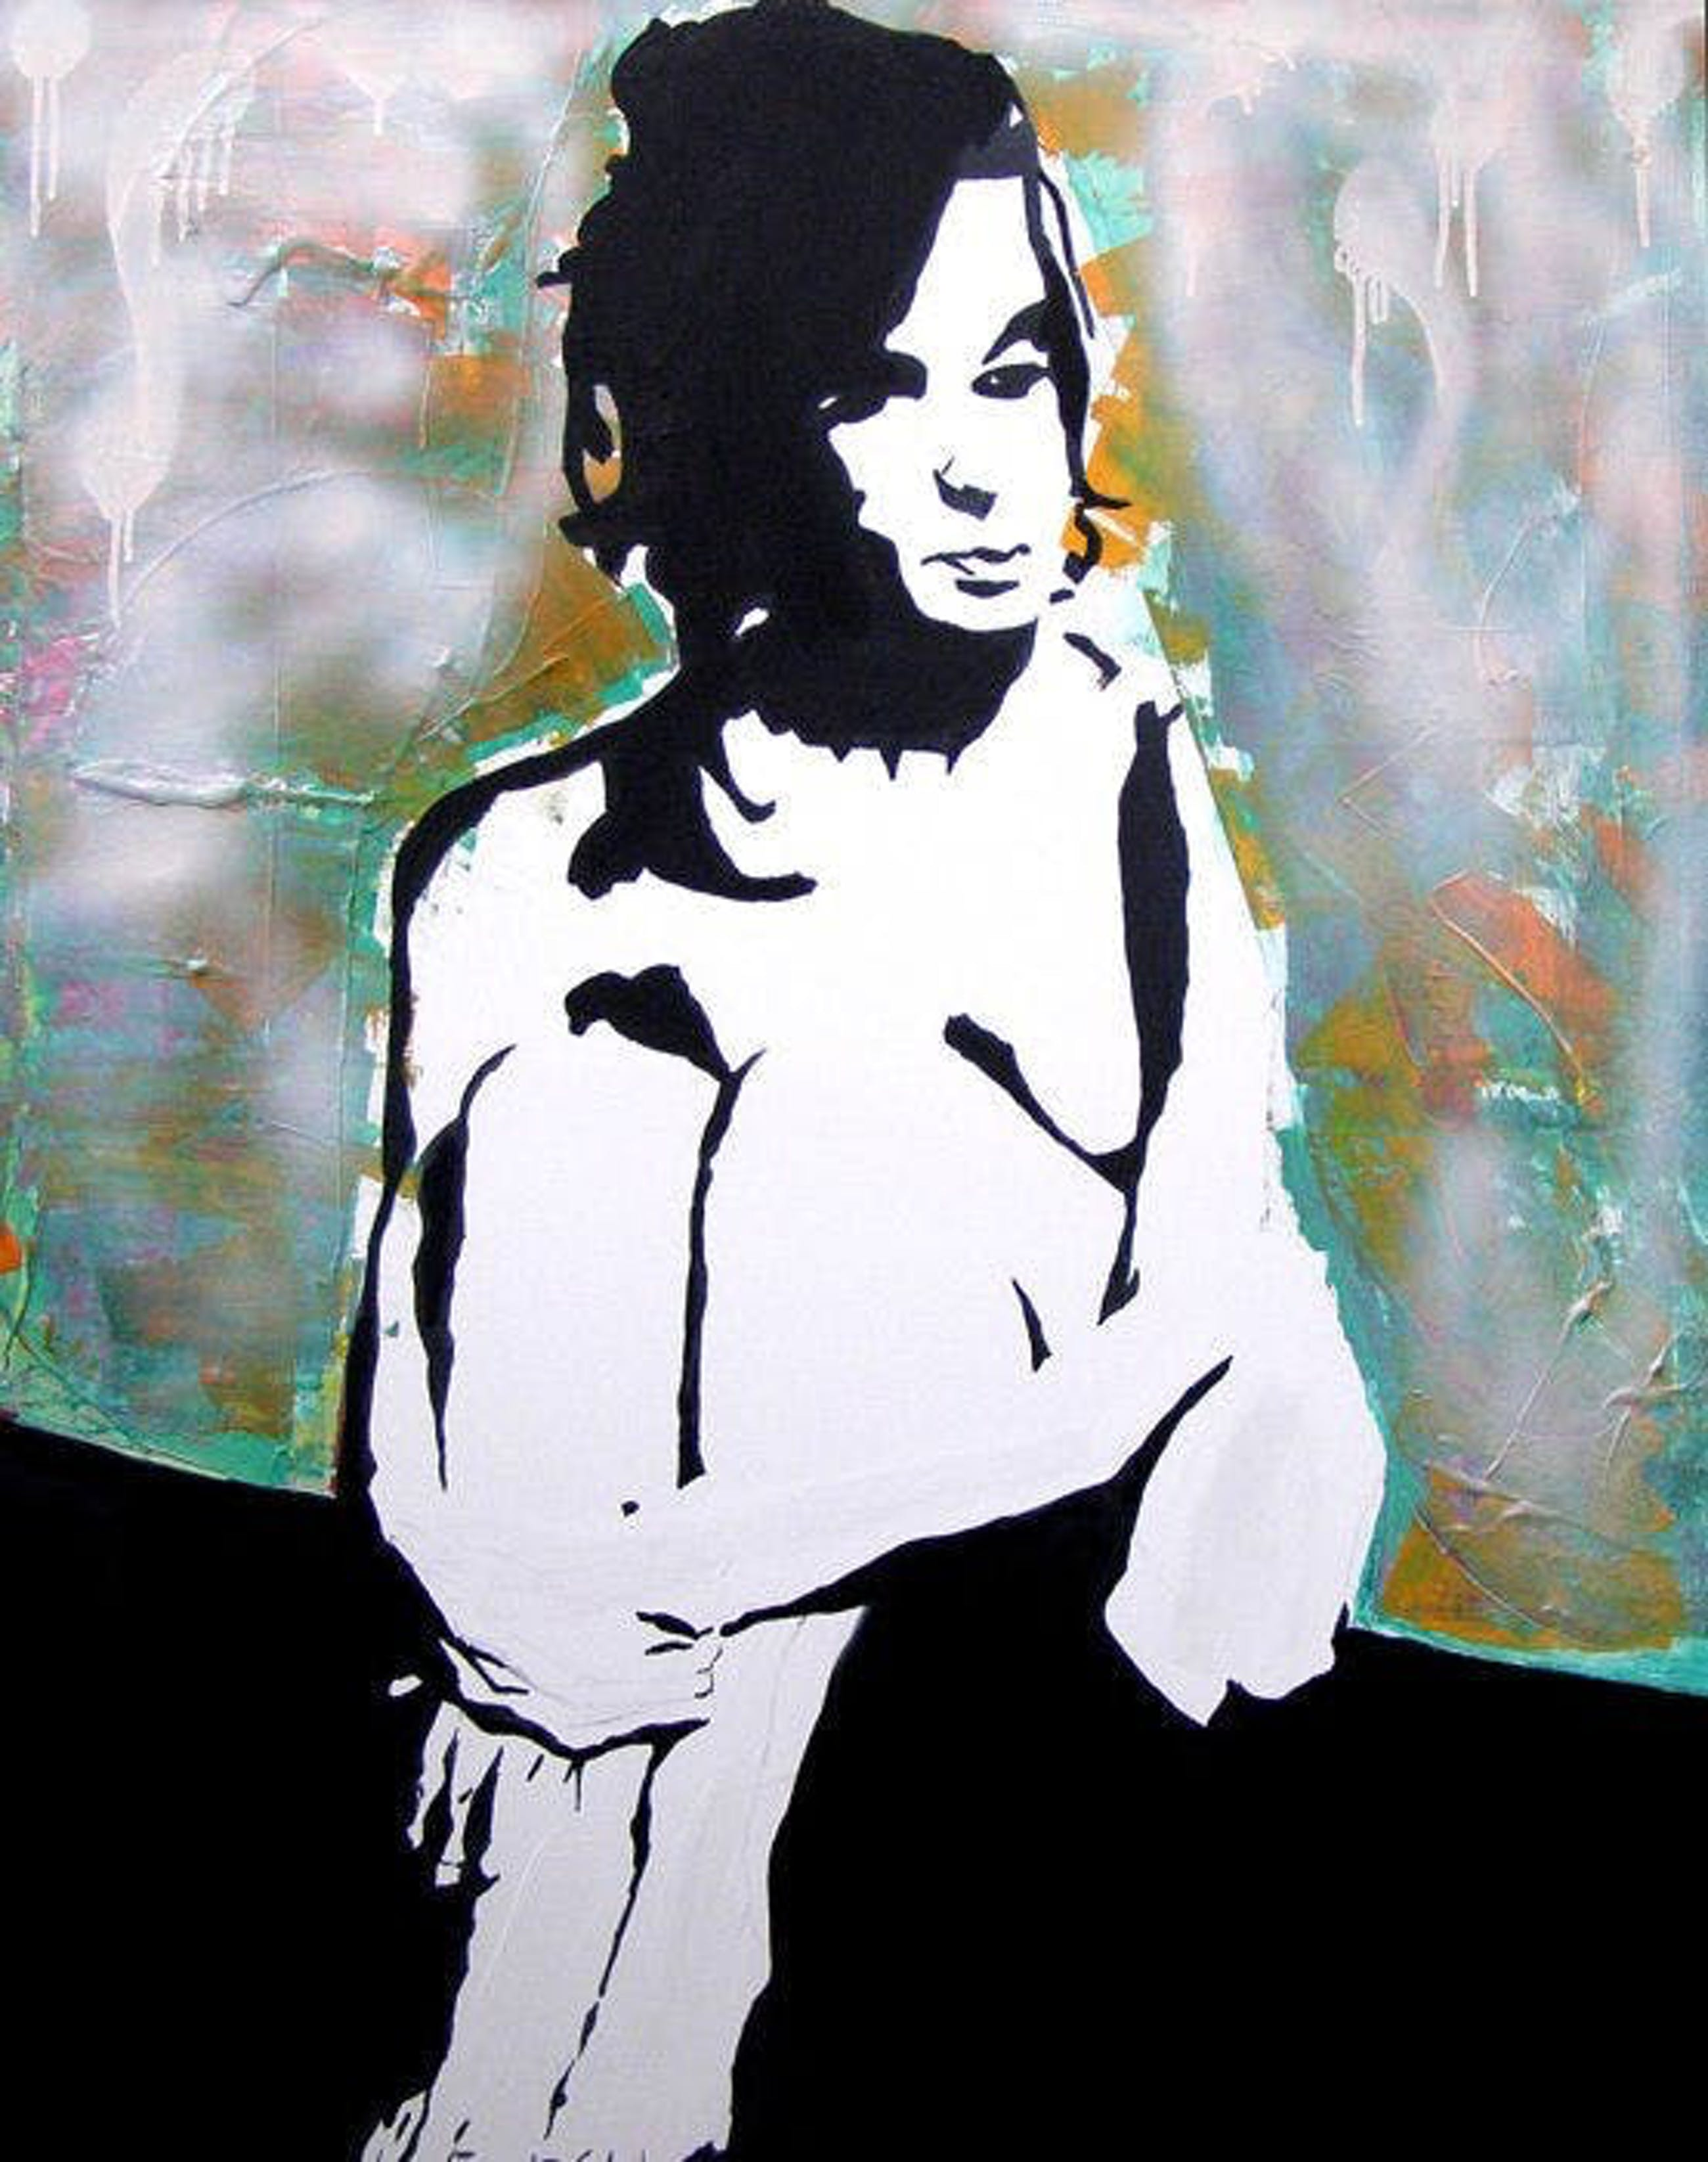 Dominik Smolik - Nude on the abstract background kopen? Bied vanaf 80!